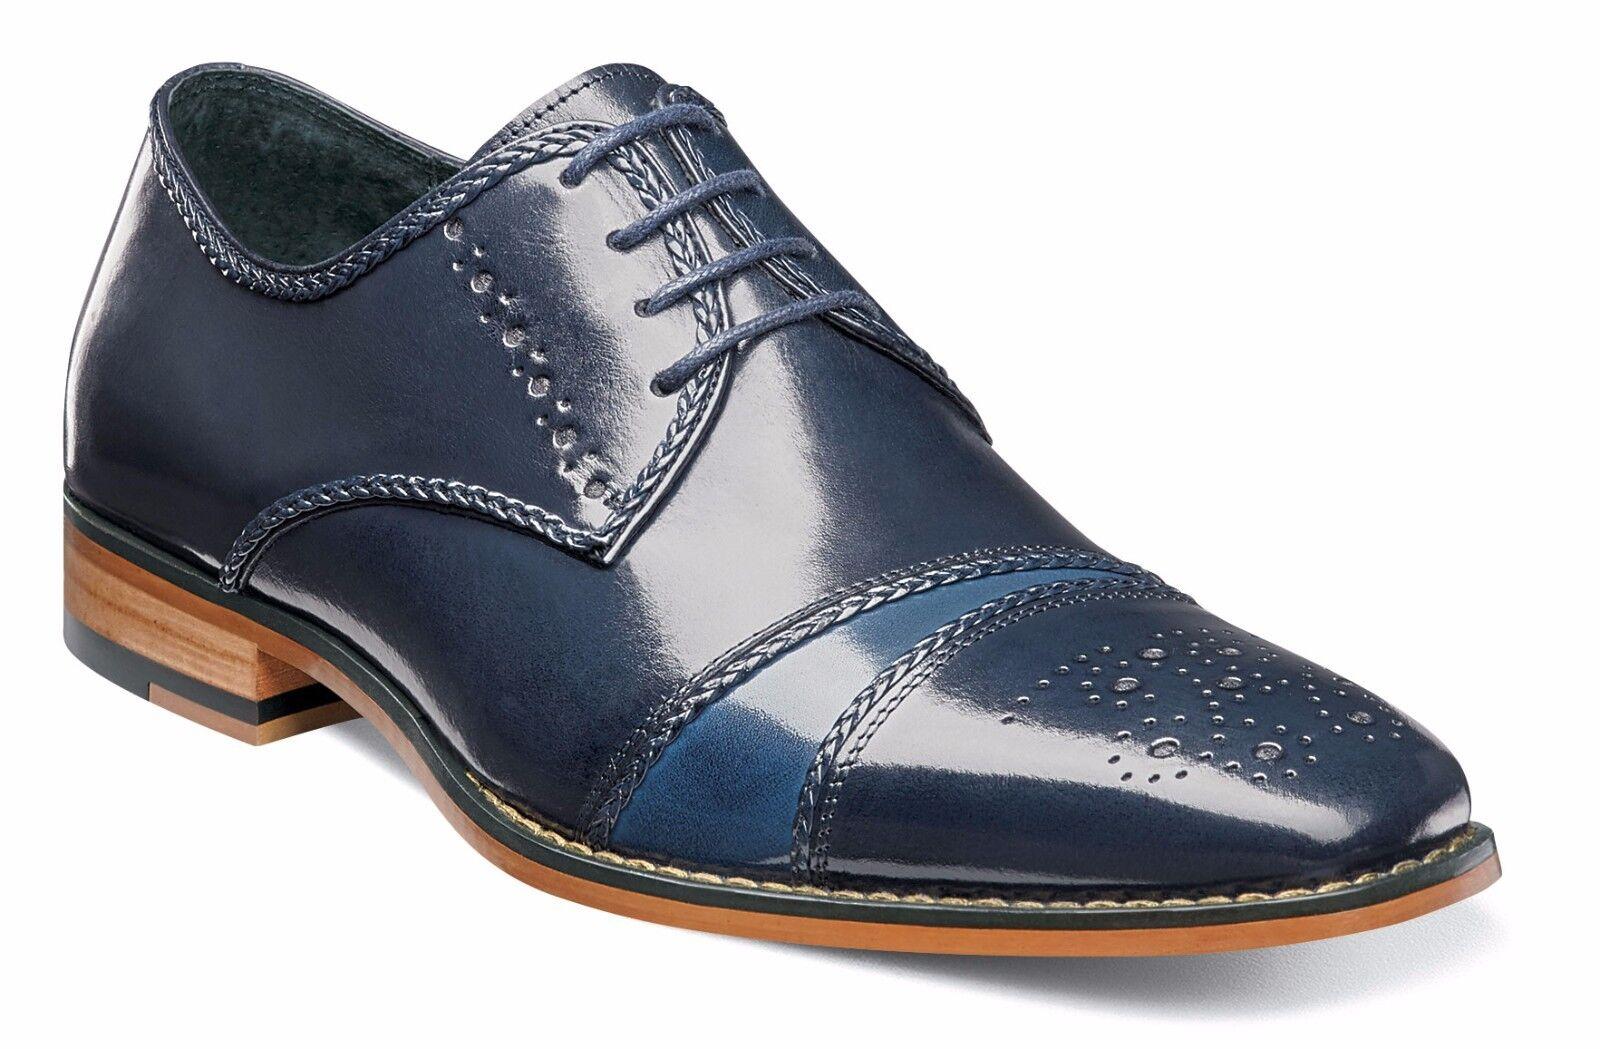 Stacy Adams Hombre Azul Marino Multi Talbot Gorra Punta Oxford Zapato